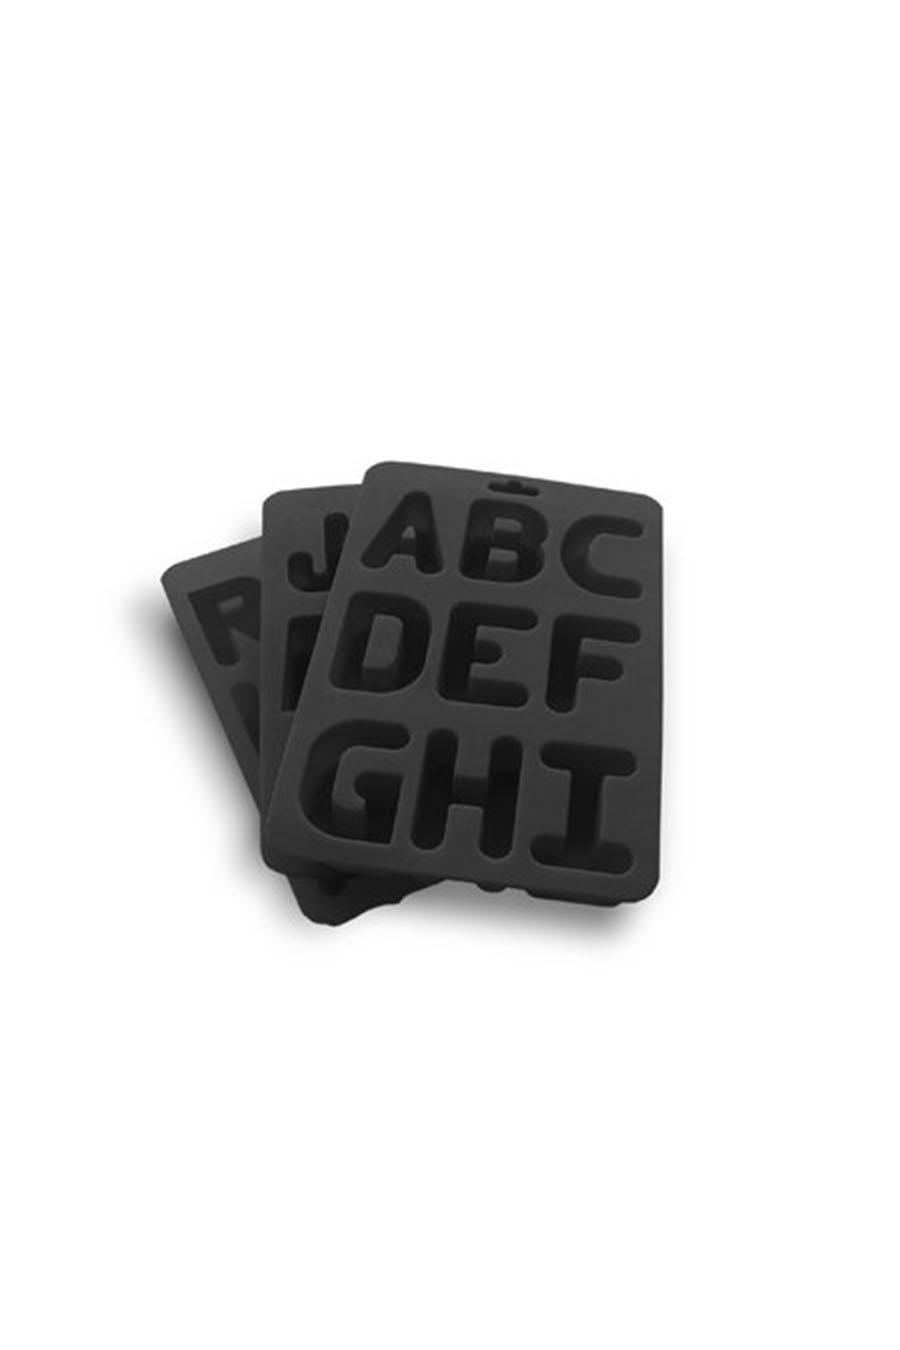 Alphabet Ice Tray